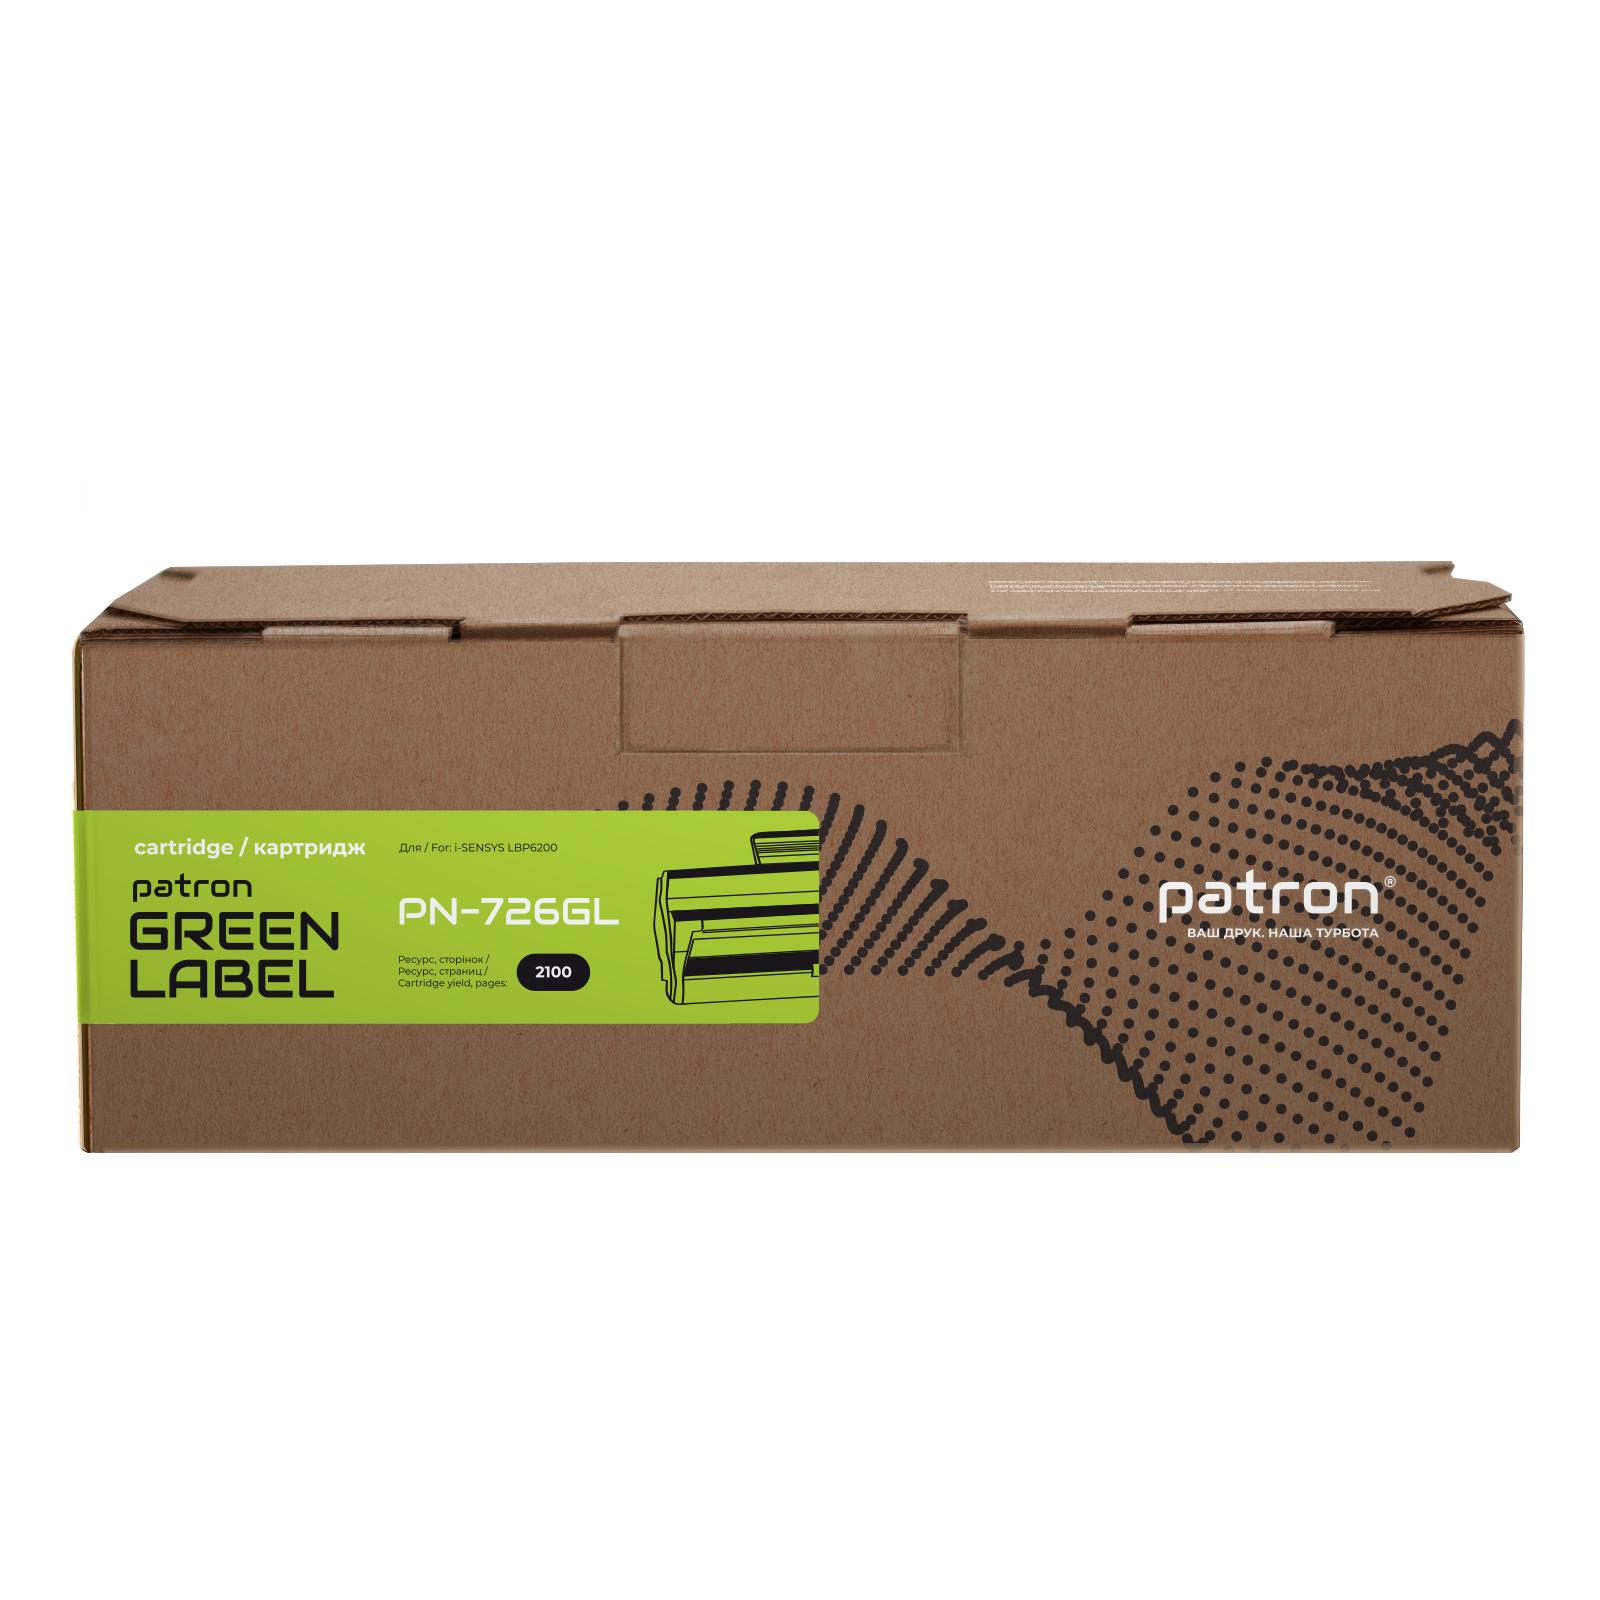 Картридж Patron CANON 726 GREEN Label (PN-726GL) изображение 2